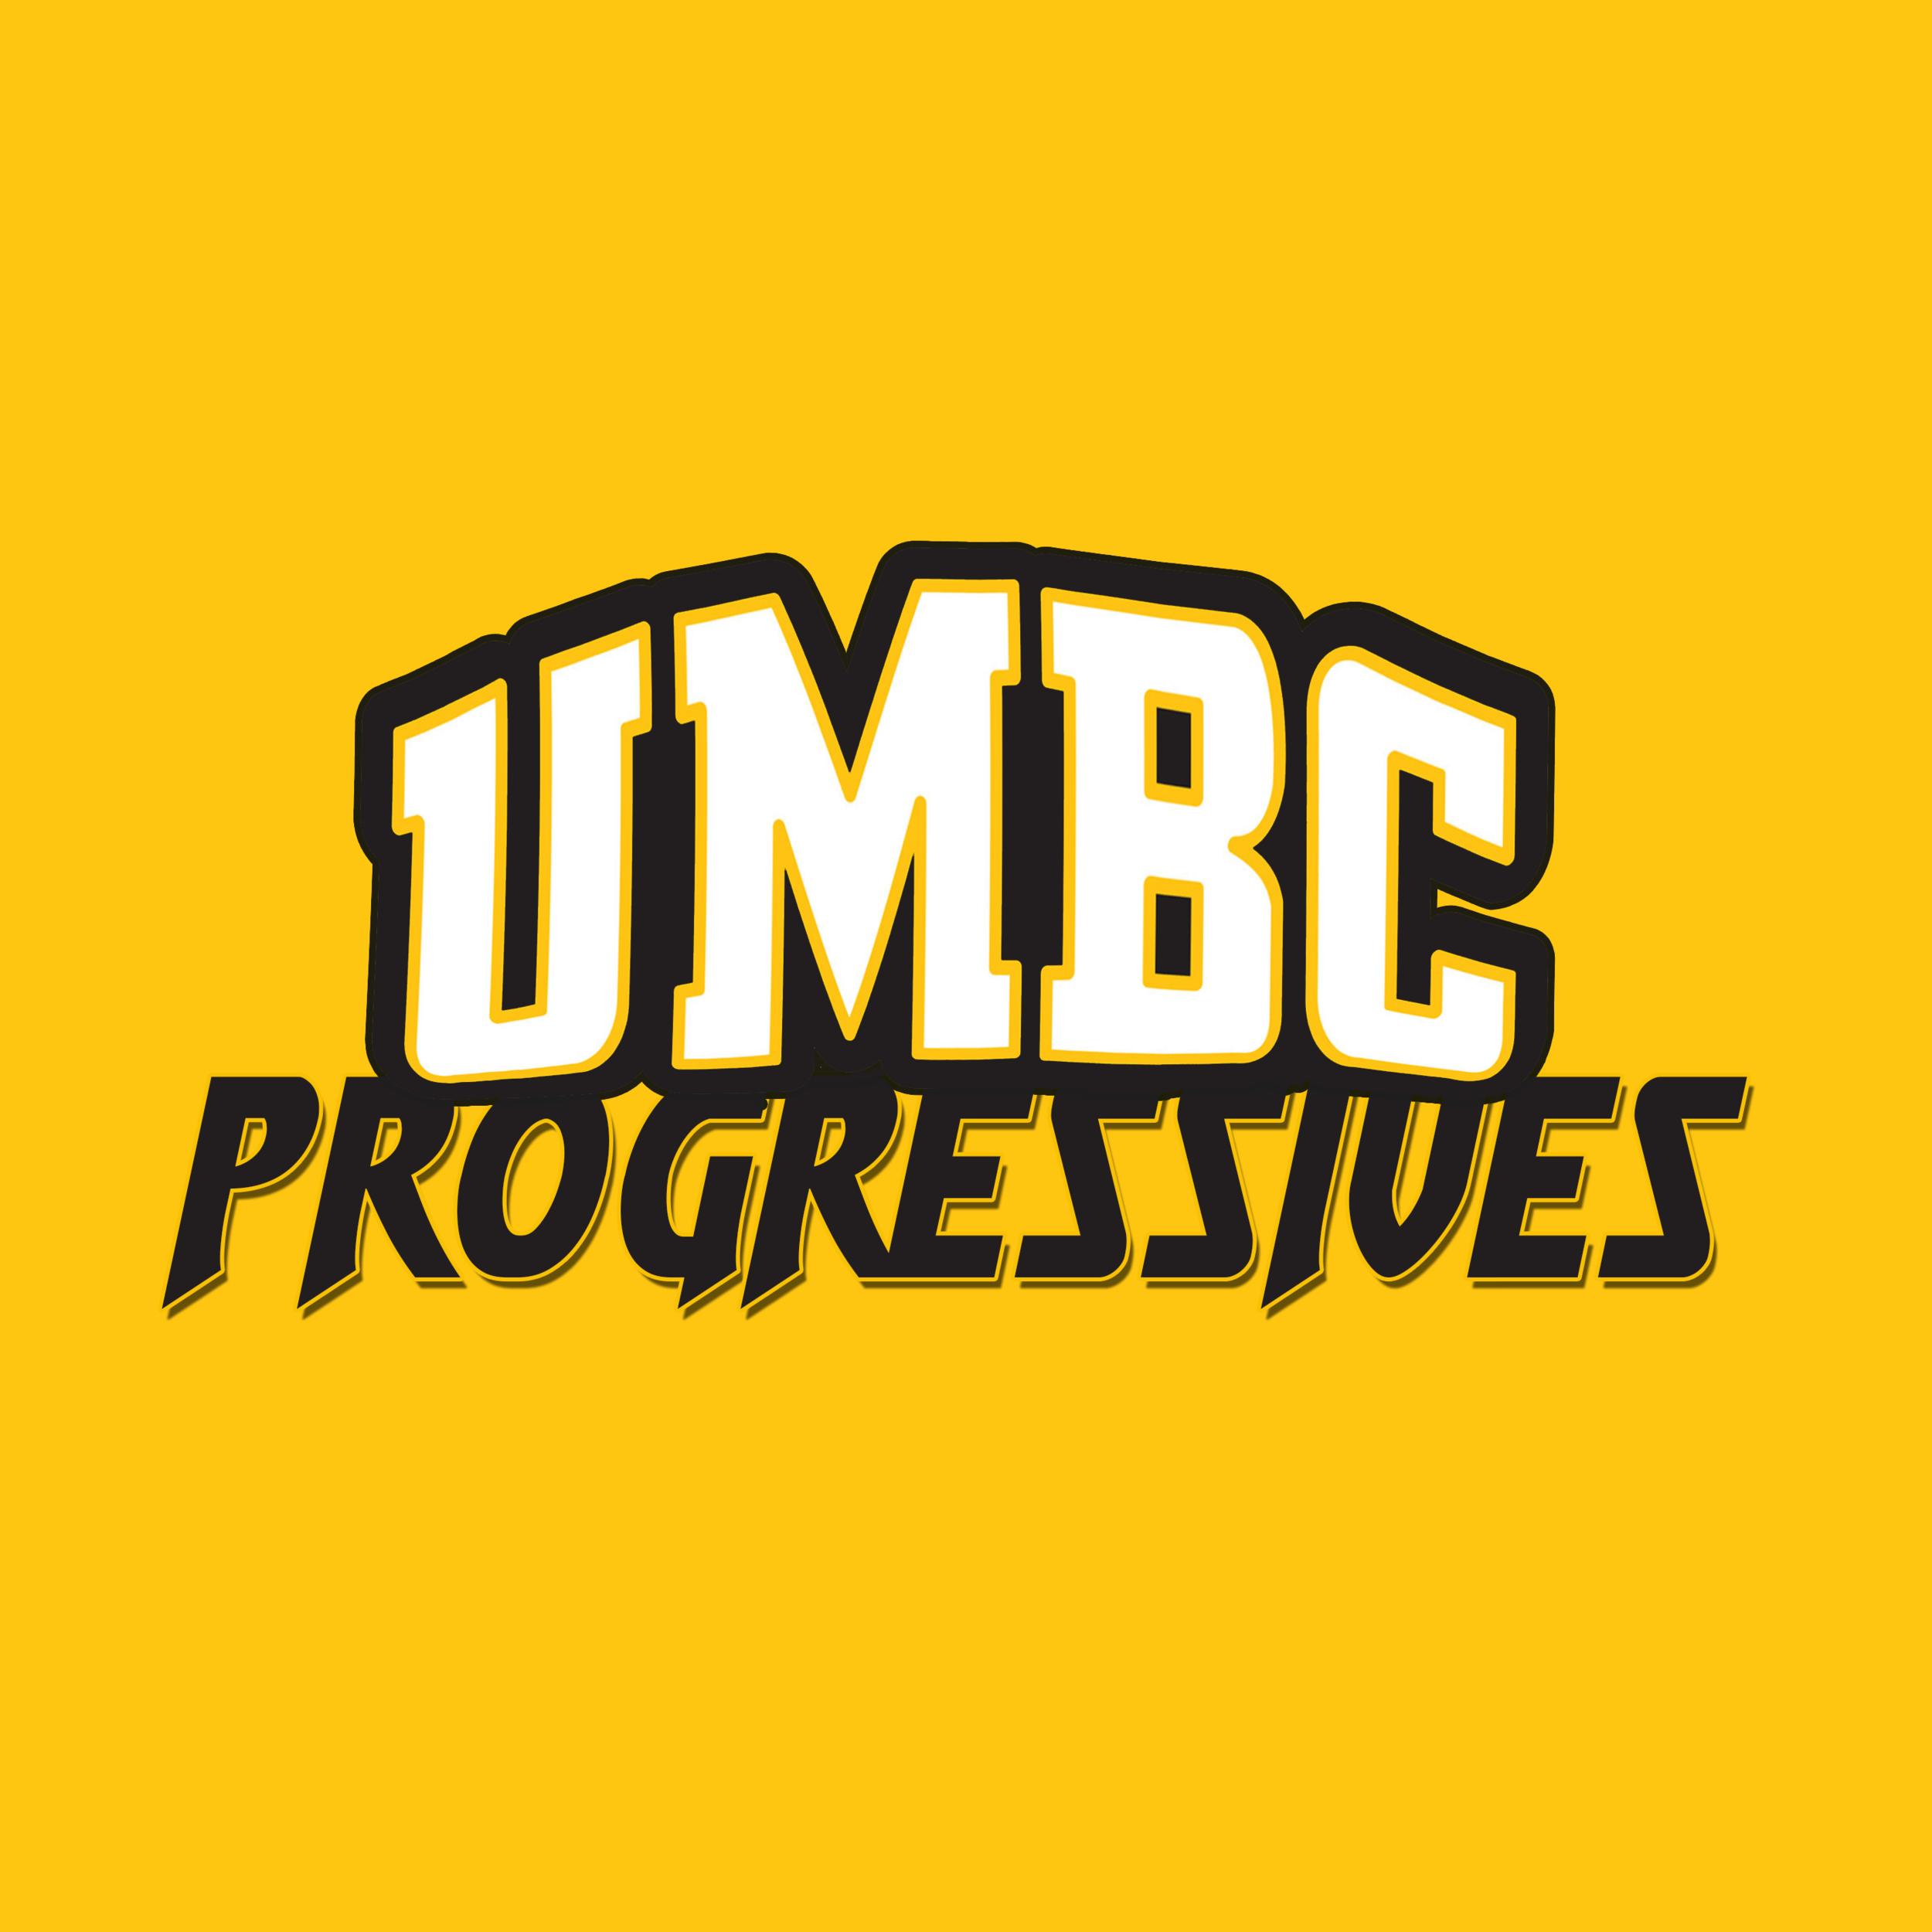 UMBCprogressives1.png